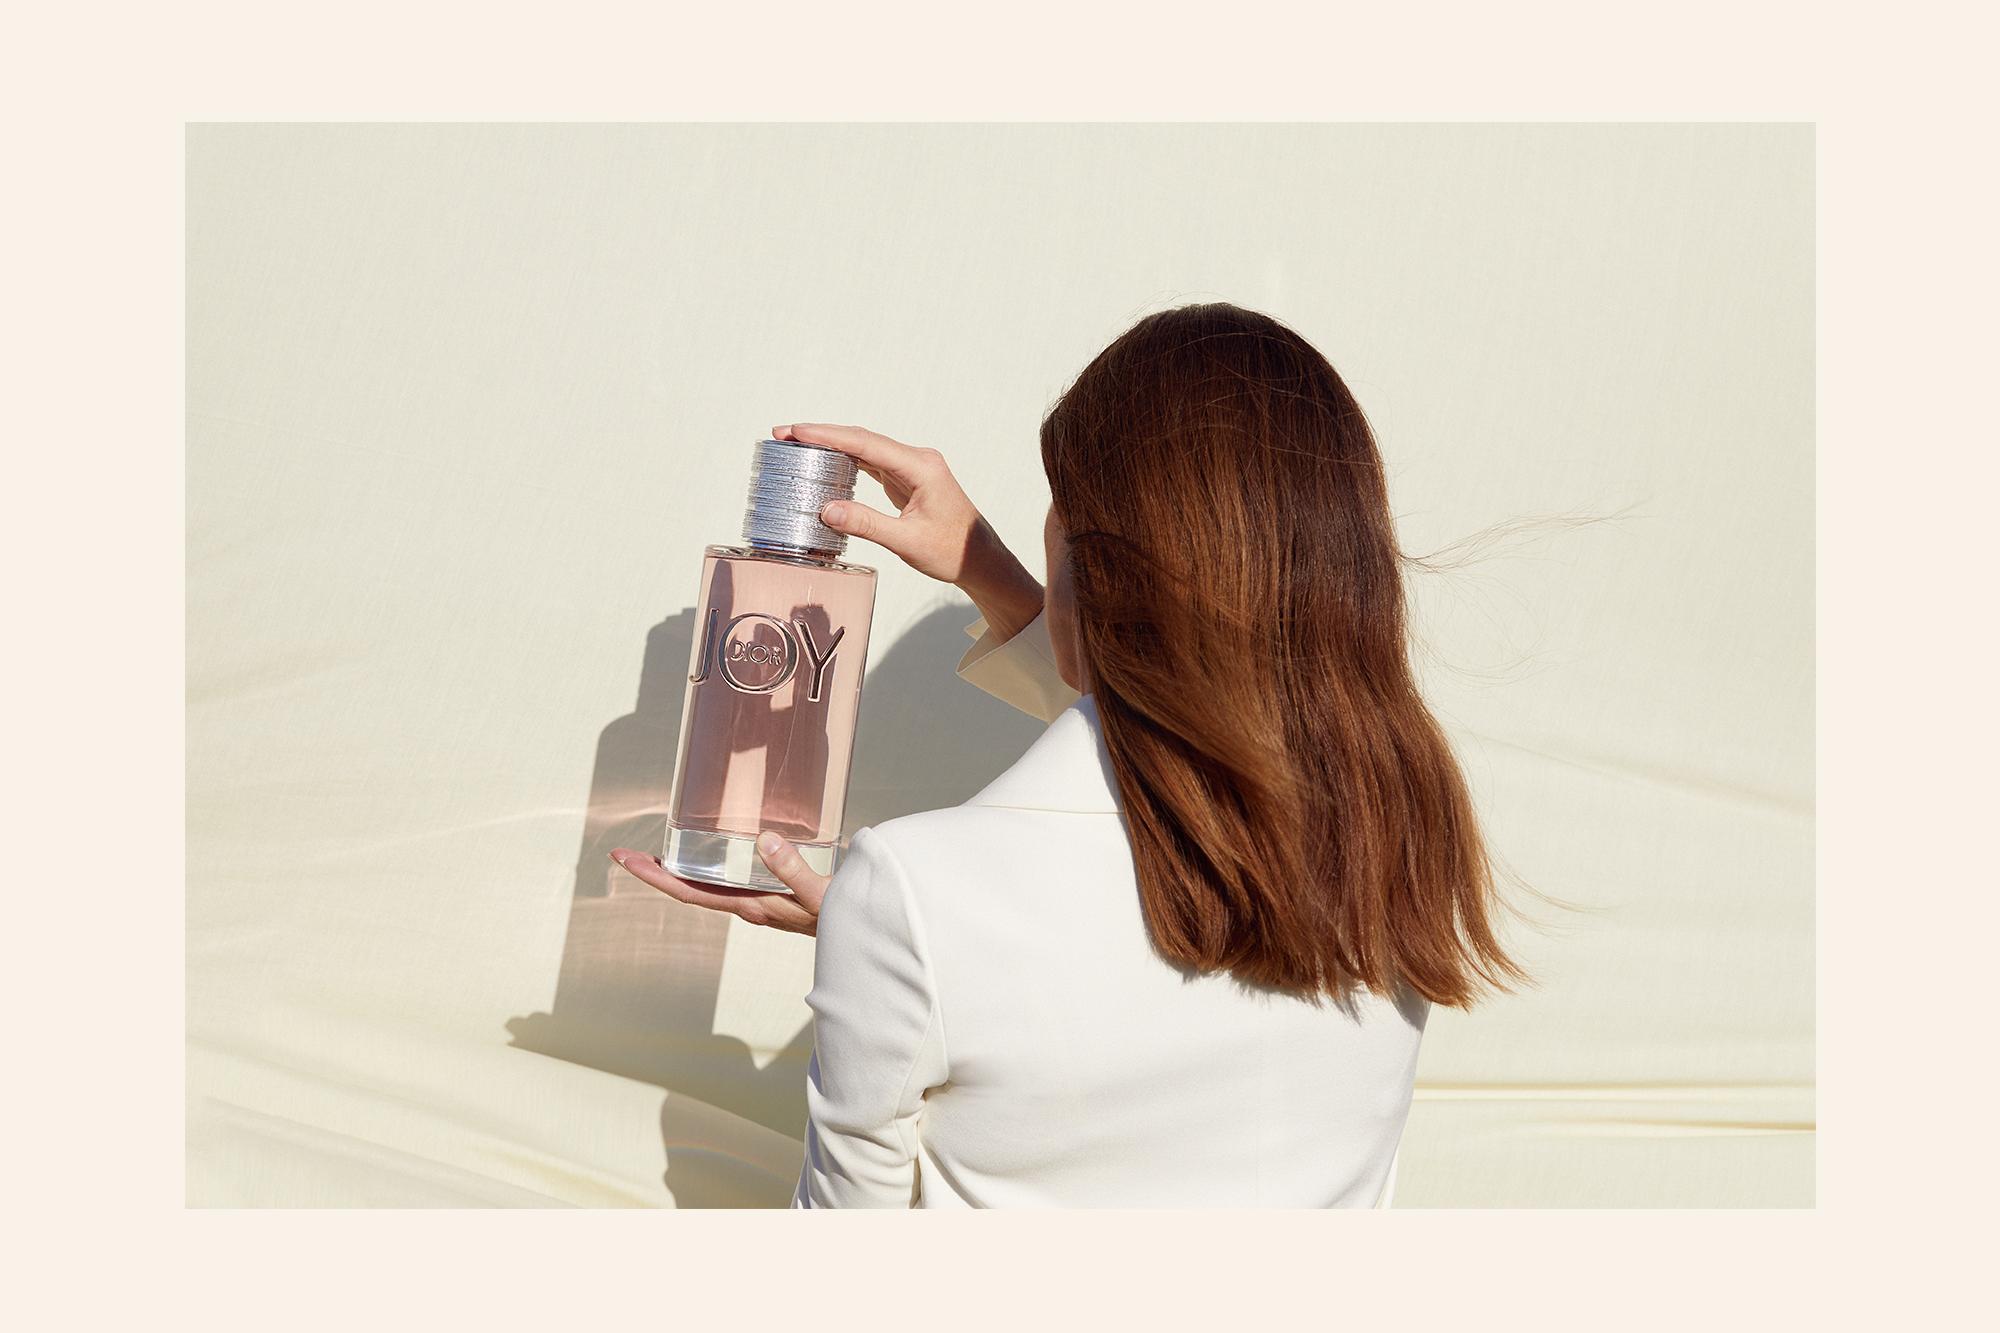 Perfume, Editoria., Dior, Christas, 2018, Joy, Perfume, Tweed